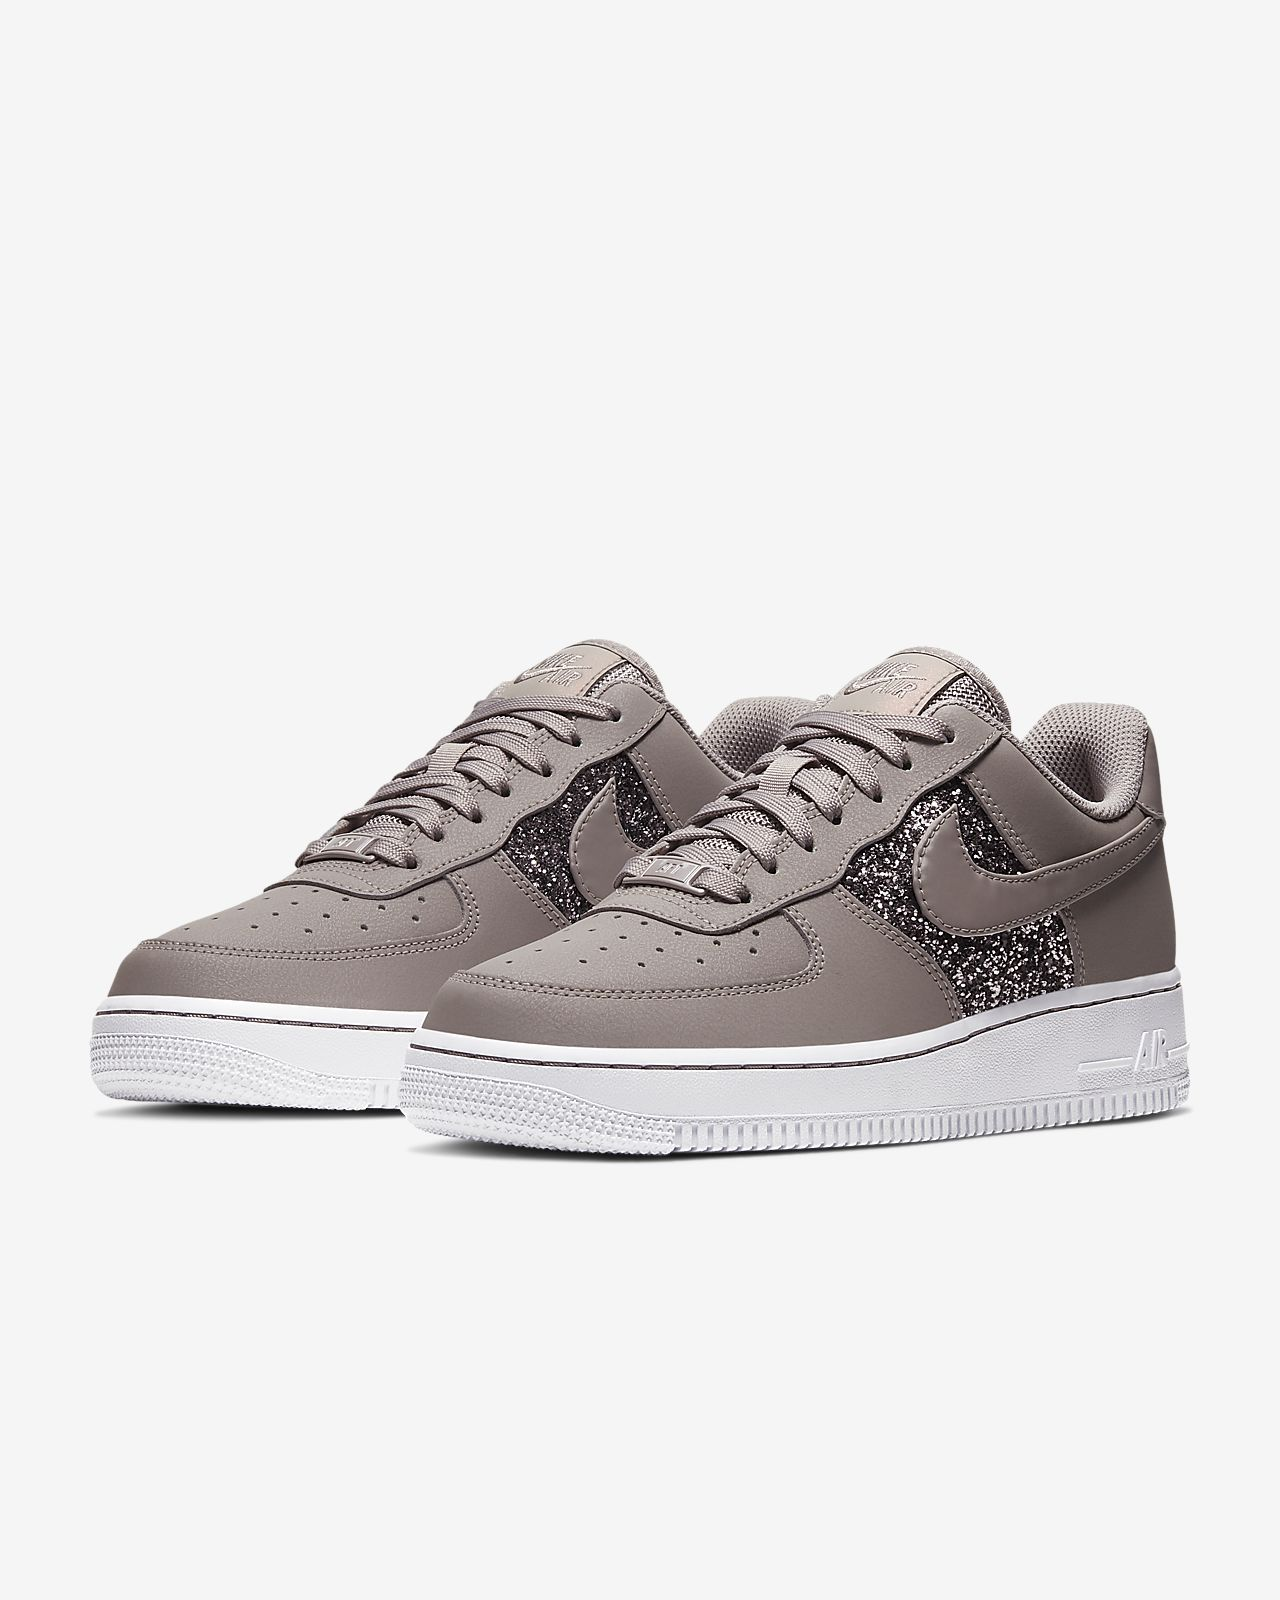 Nike Air Force 1 Low Damesschoen met glitter Top 10